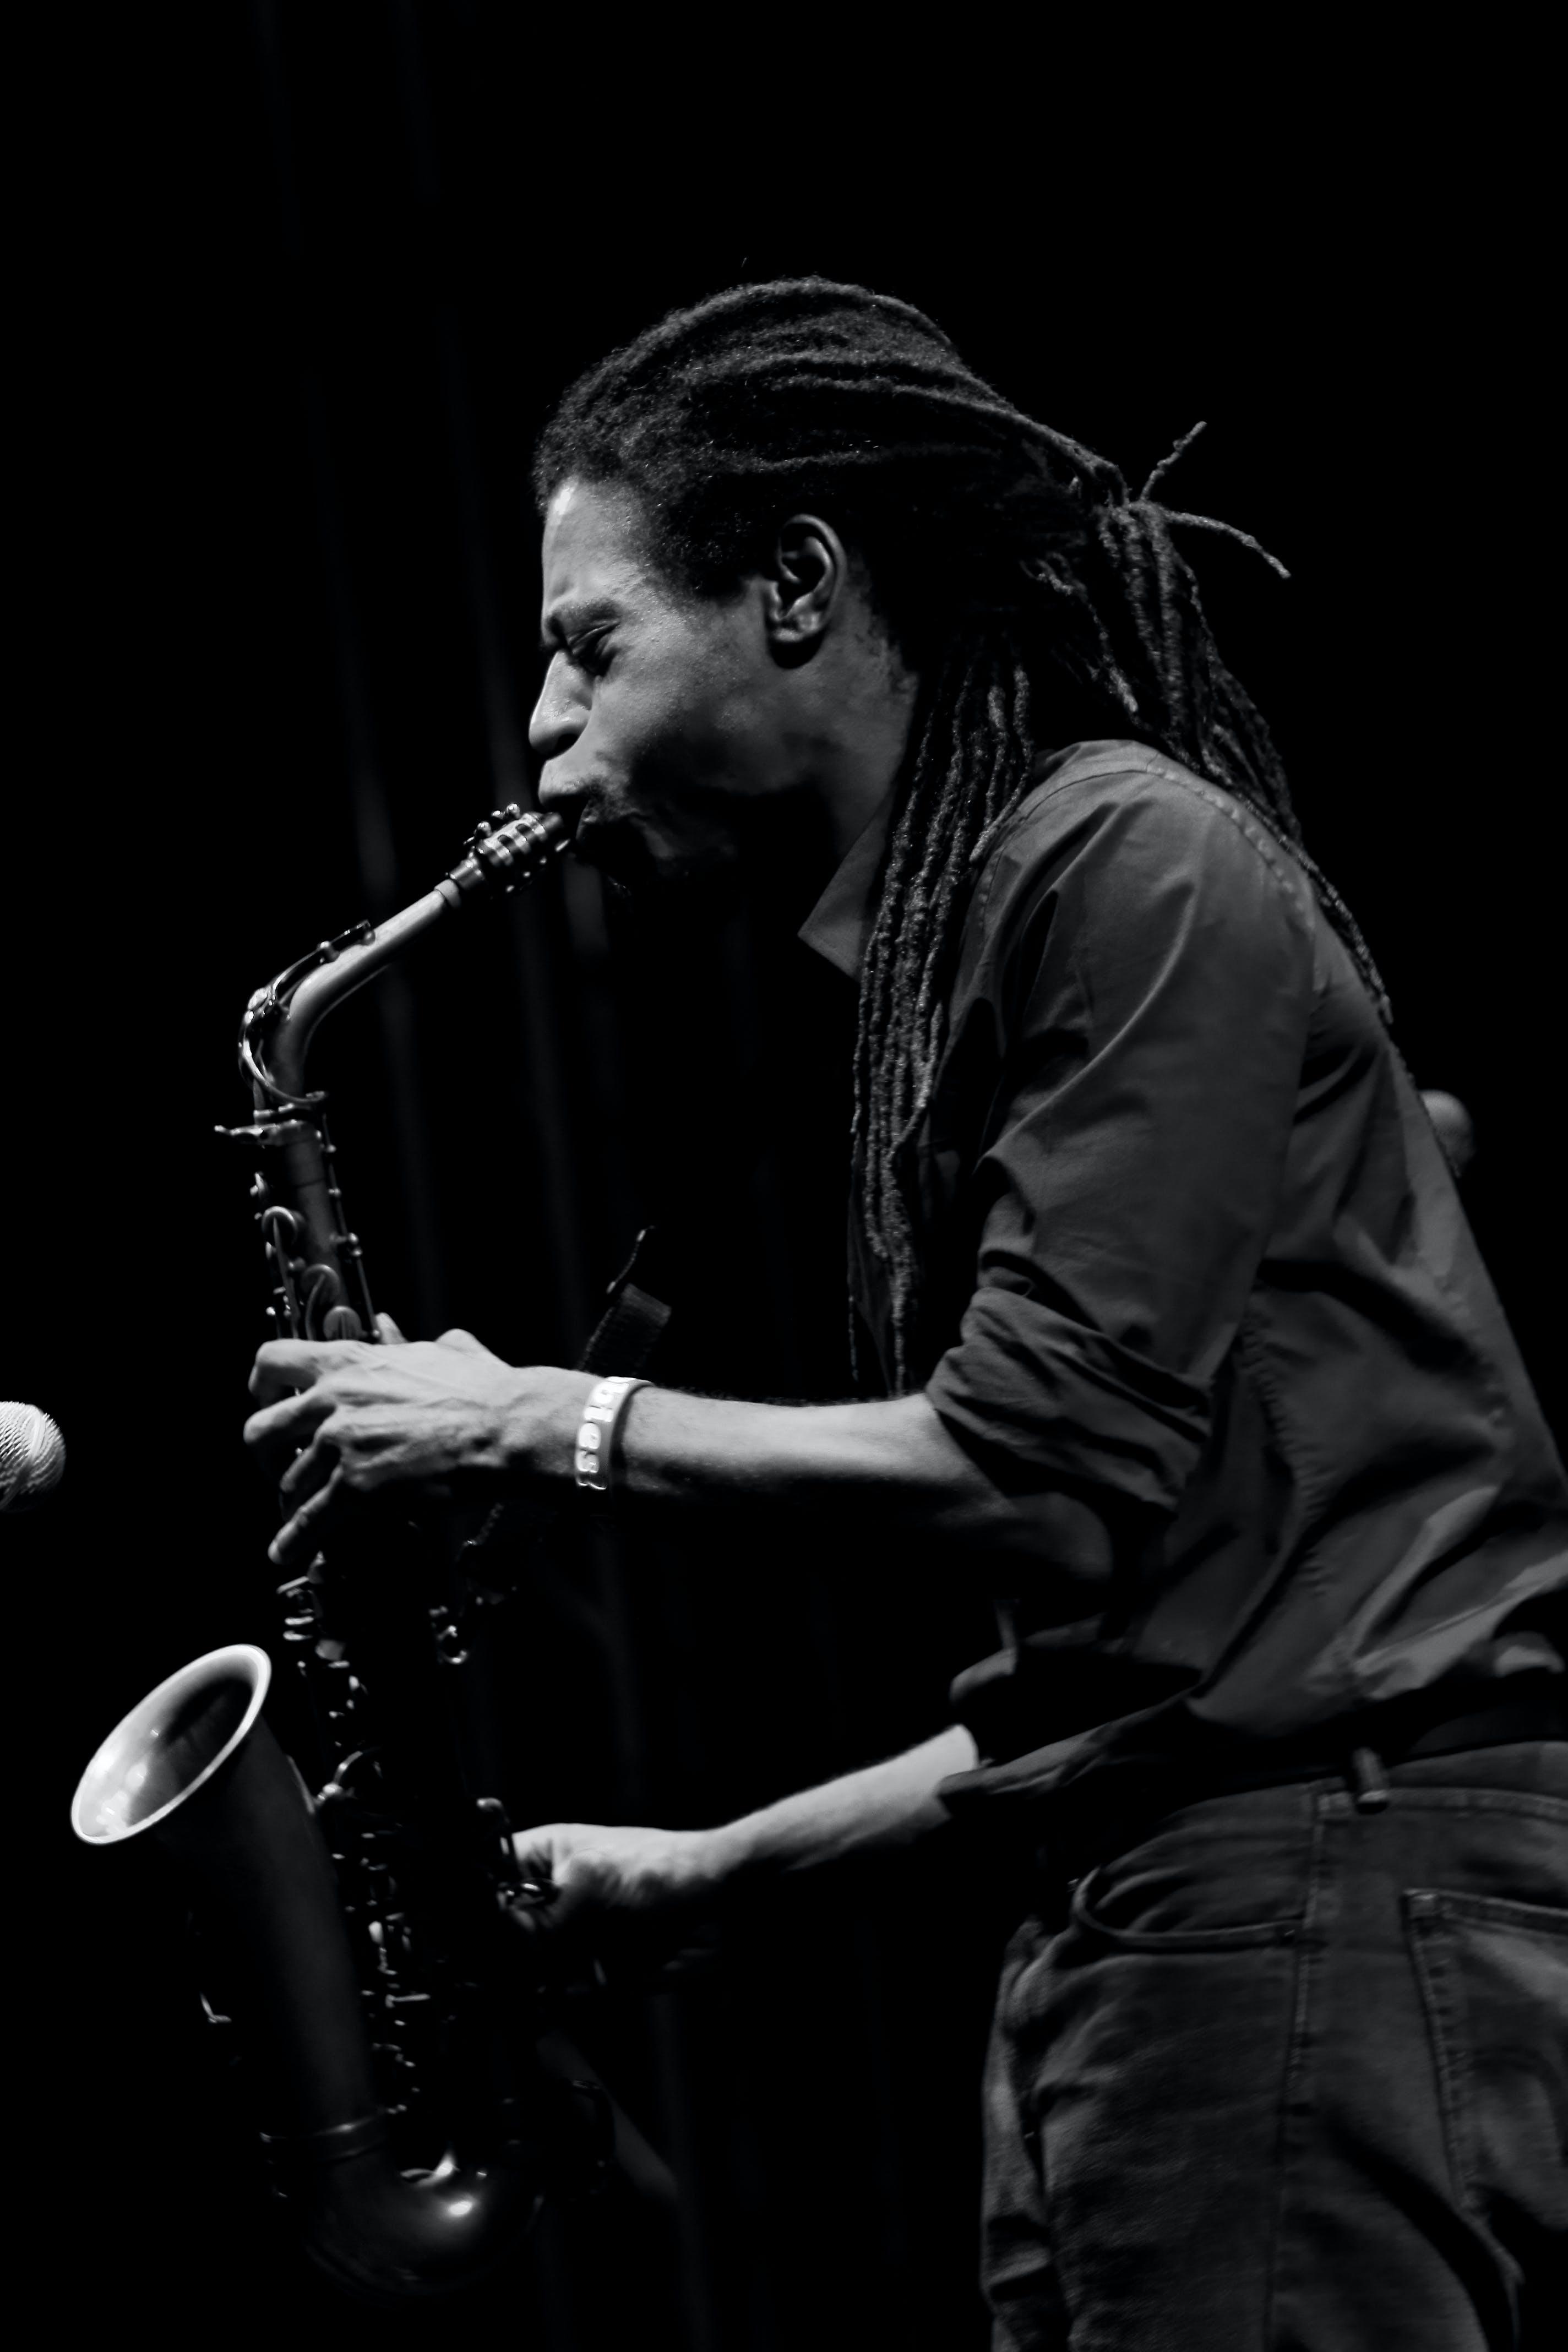 Monochrome Photo of Man Playing Saxophone